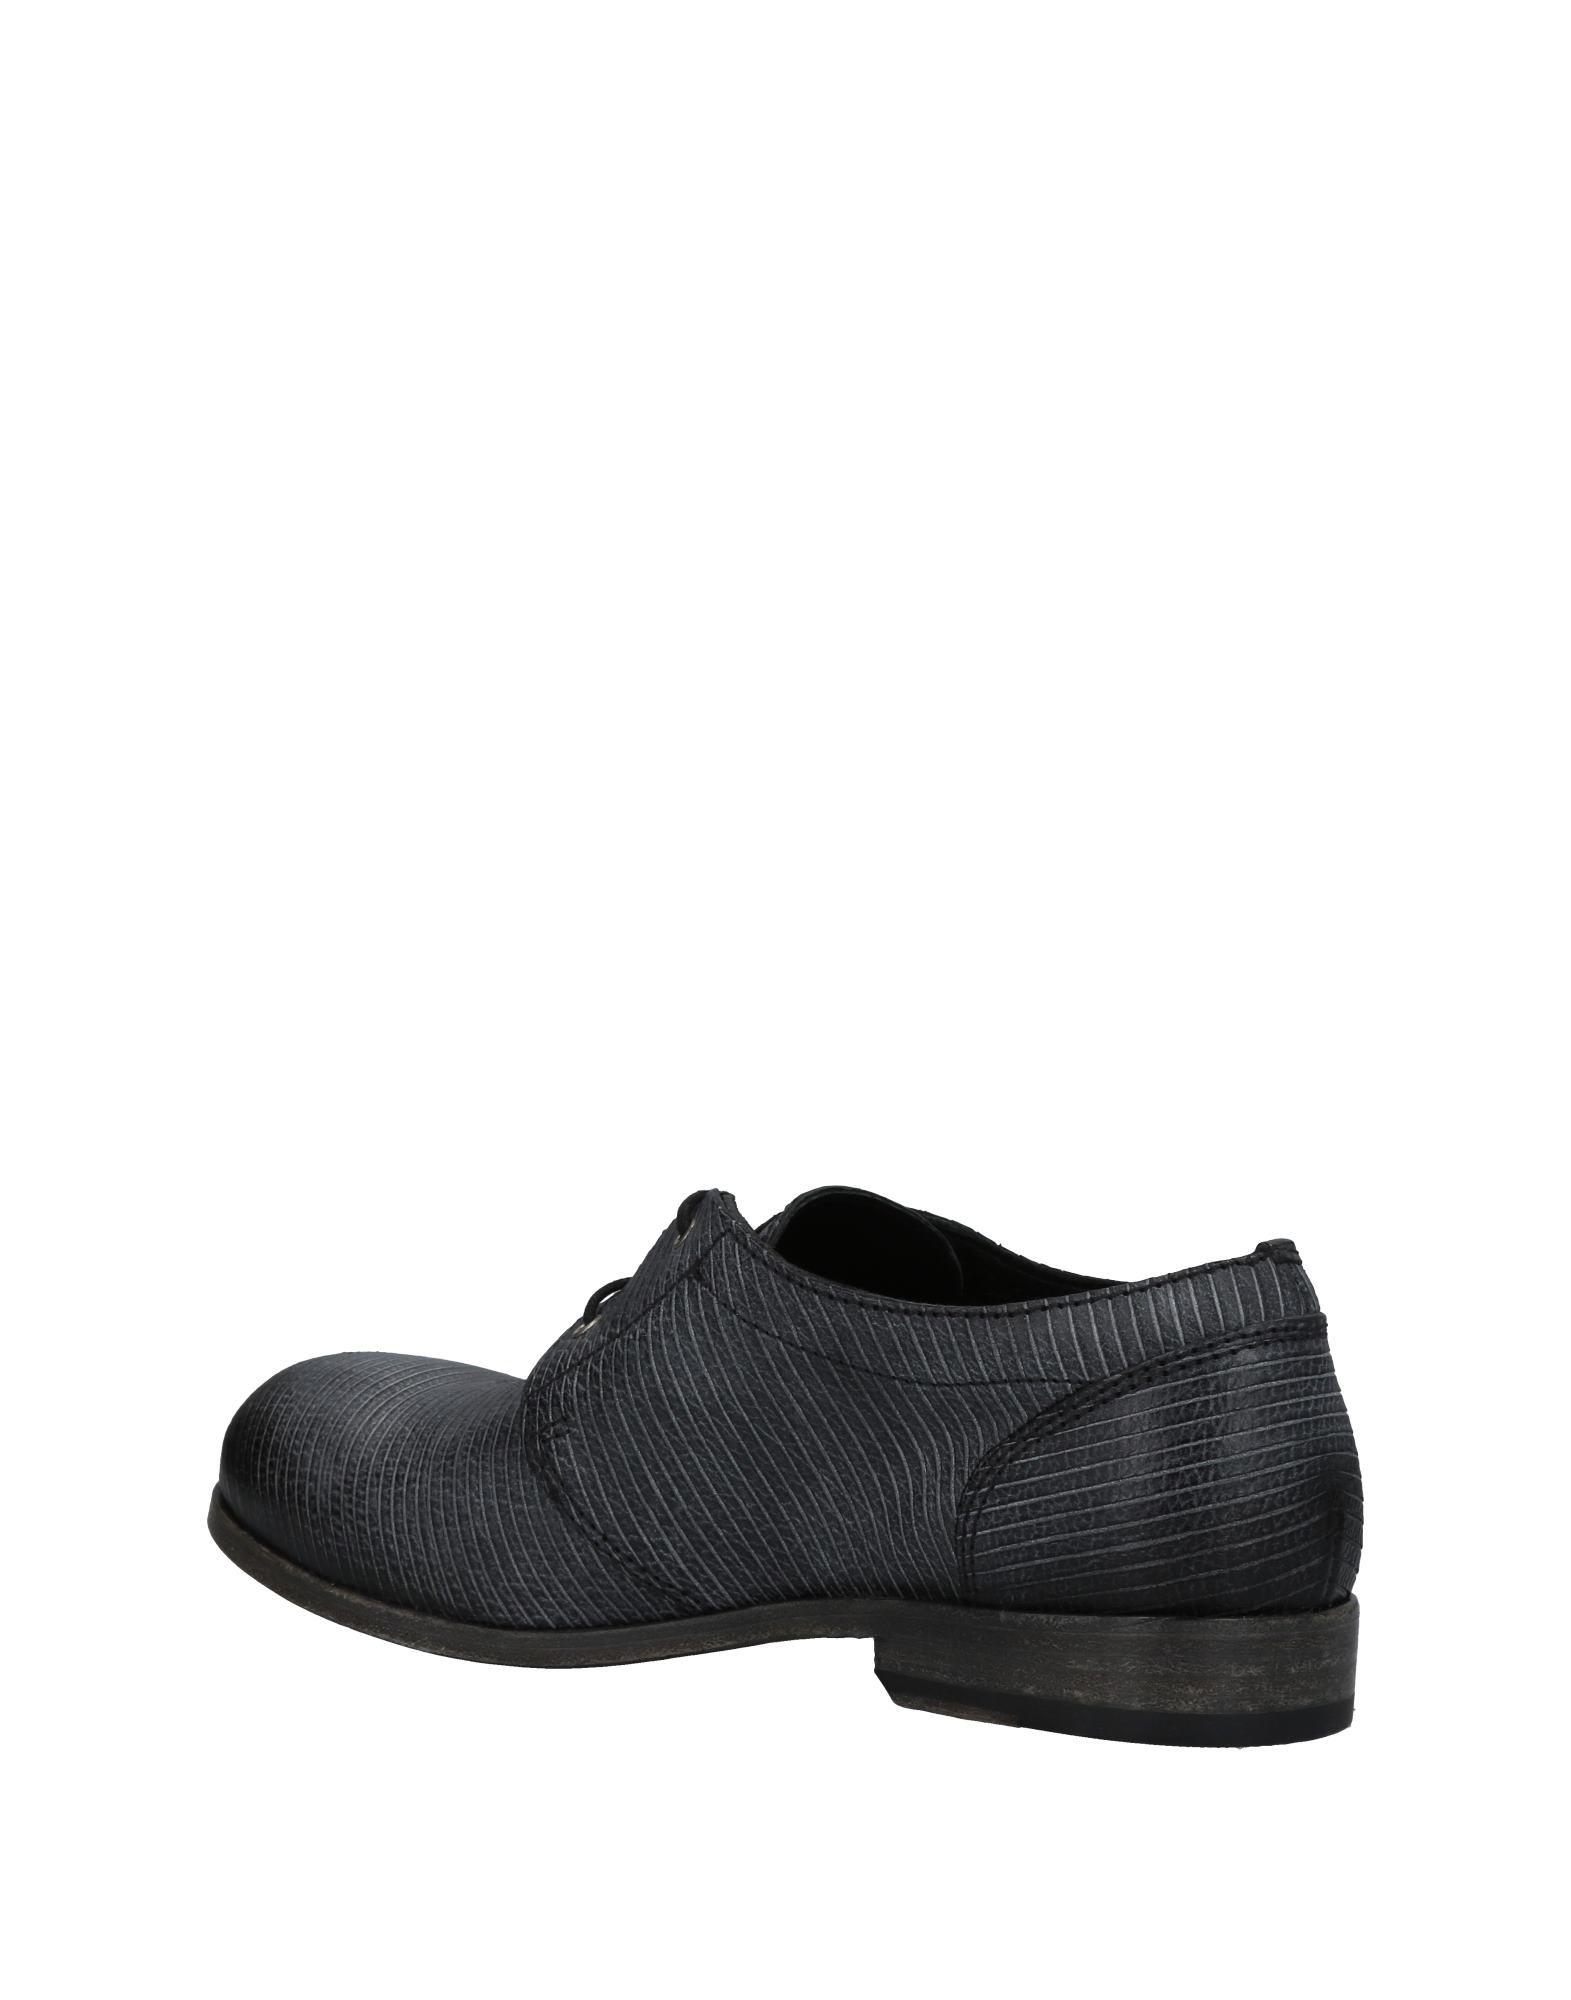 Rabatt echte Schuhe O.X.S. Schnürschuhe Herren  11455848VD